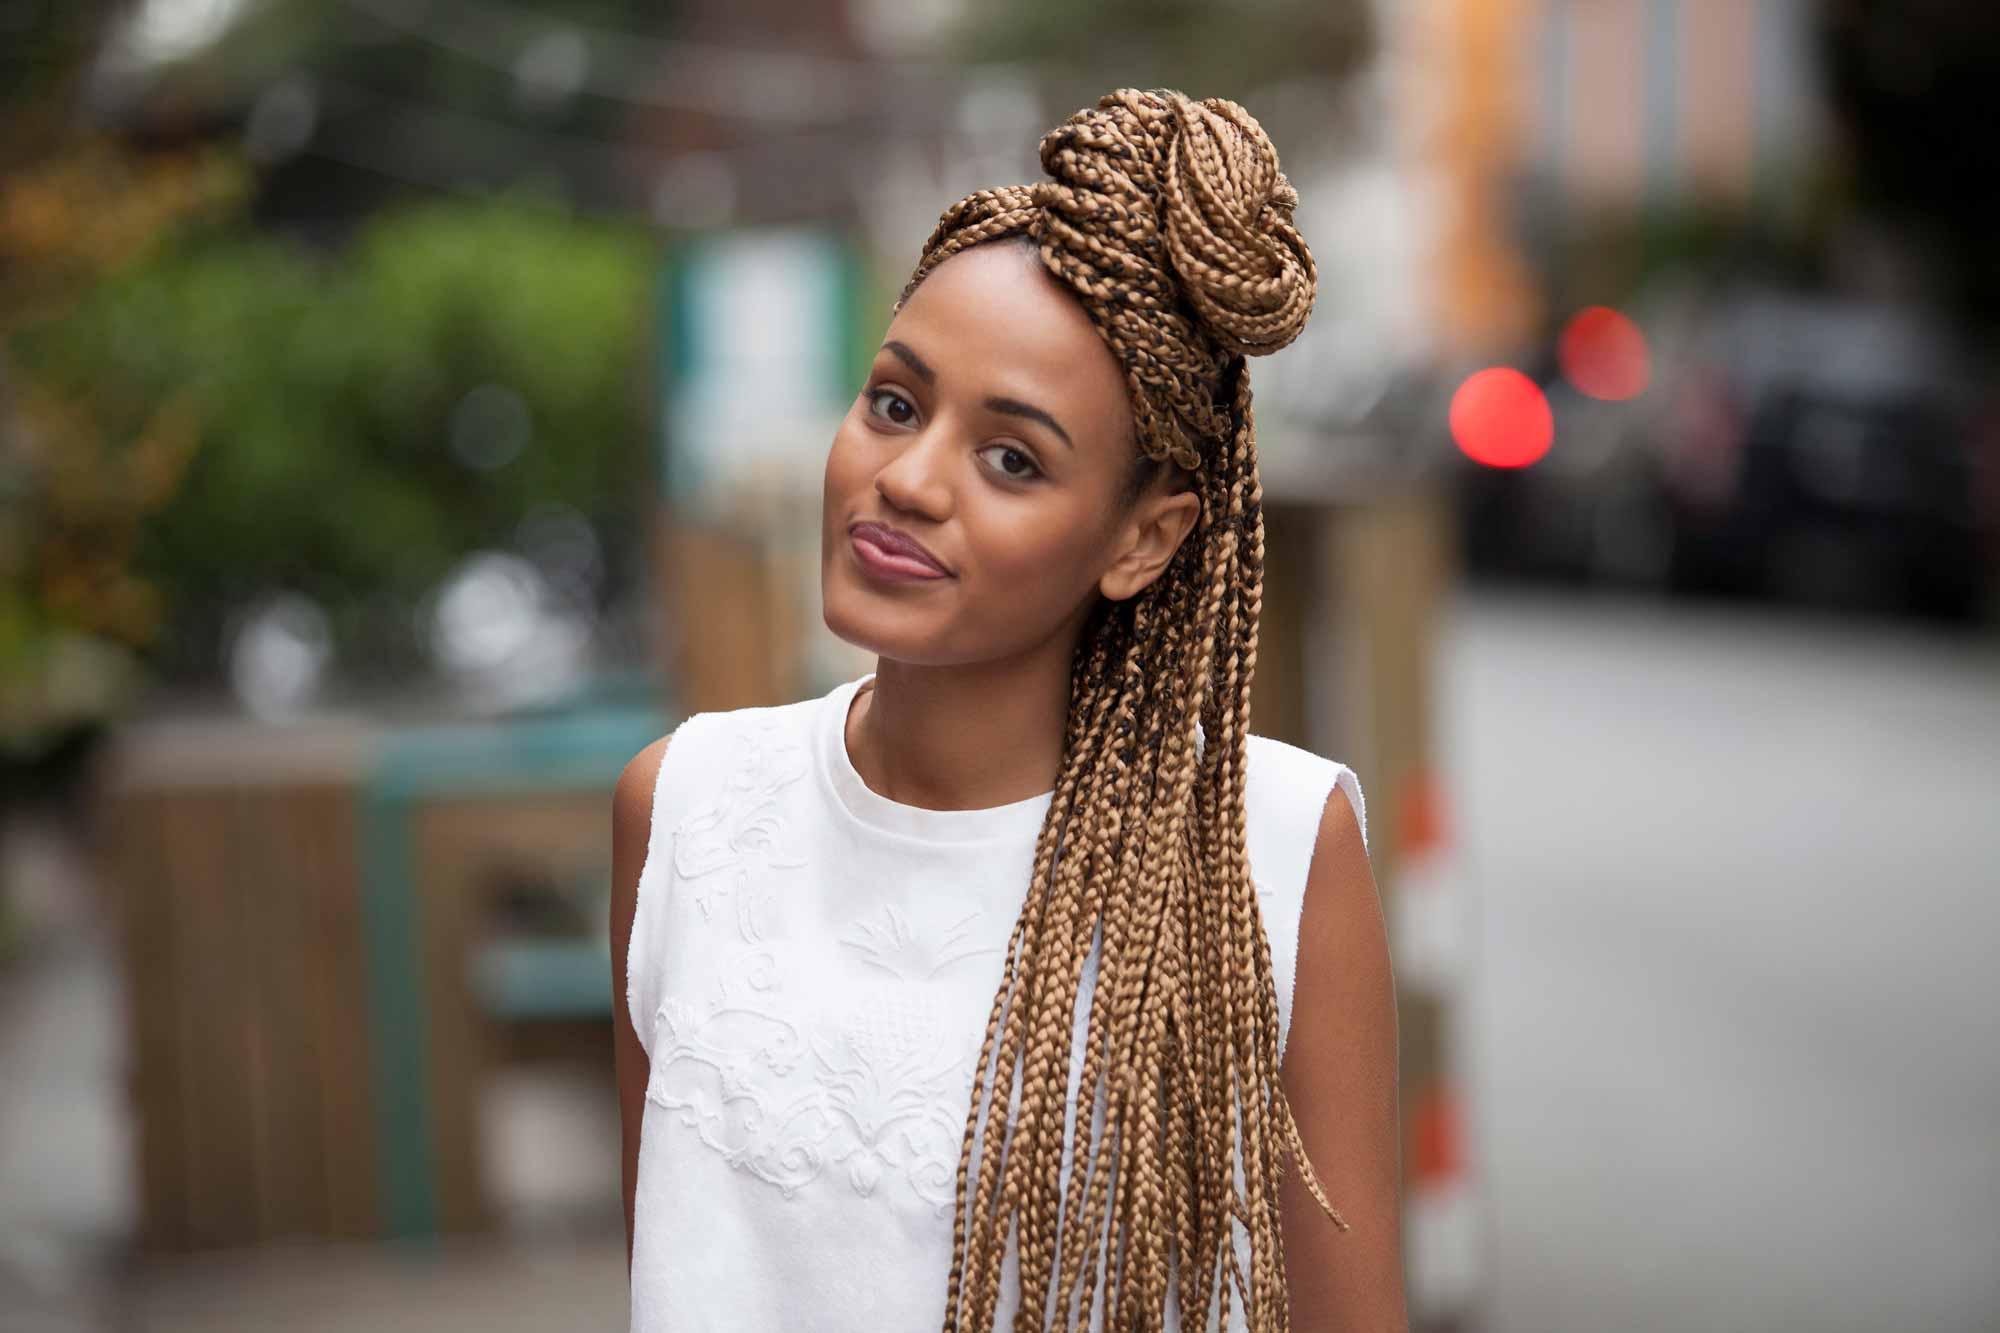 5 Easy Braided Bun Hairstyles To Try This Season